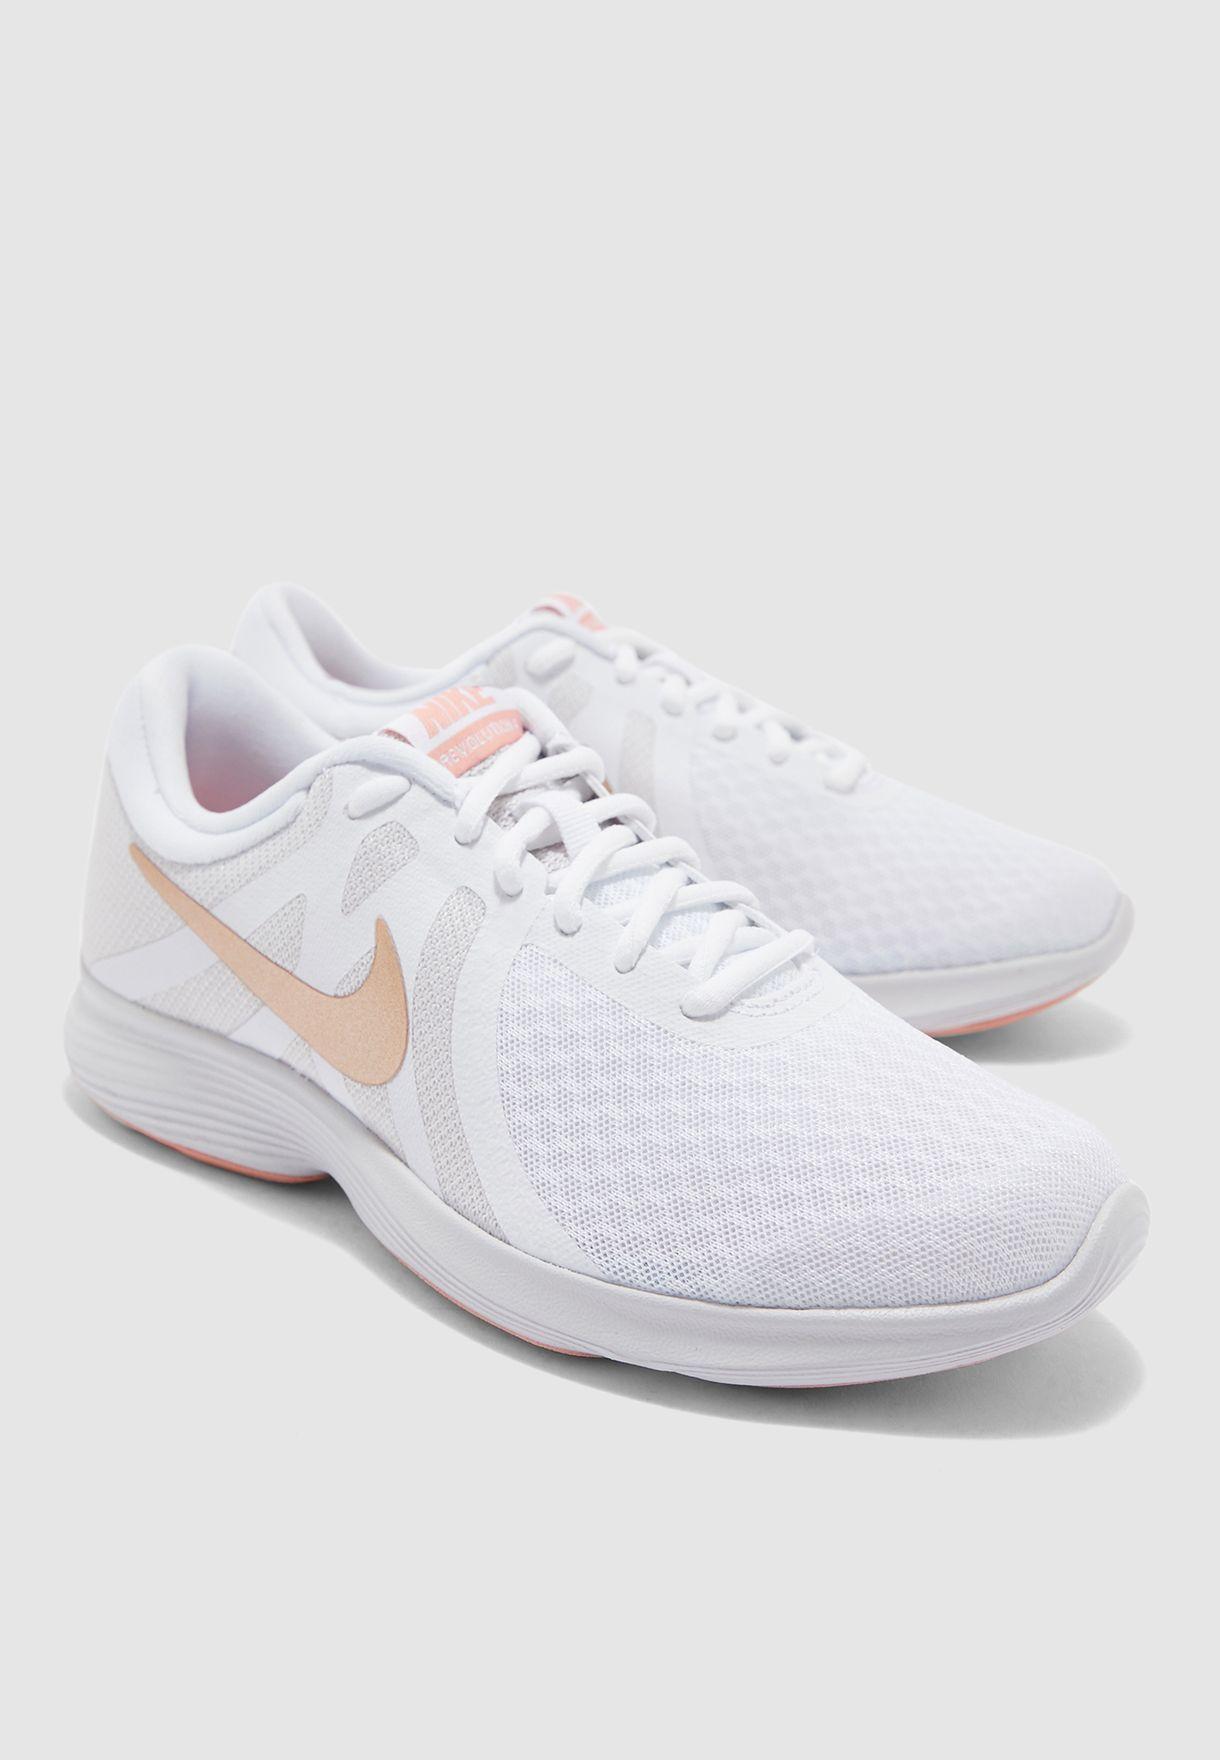 Milagroso Alcanzar Mimar  Buy Nike grey Revolution 4 EU for Women in MENA, Worldwide | AJ3491-102